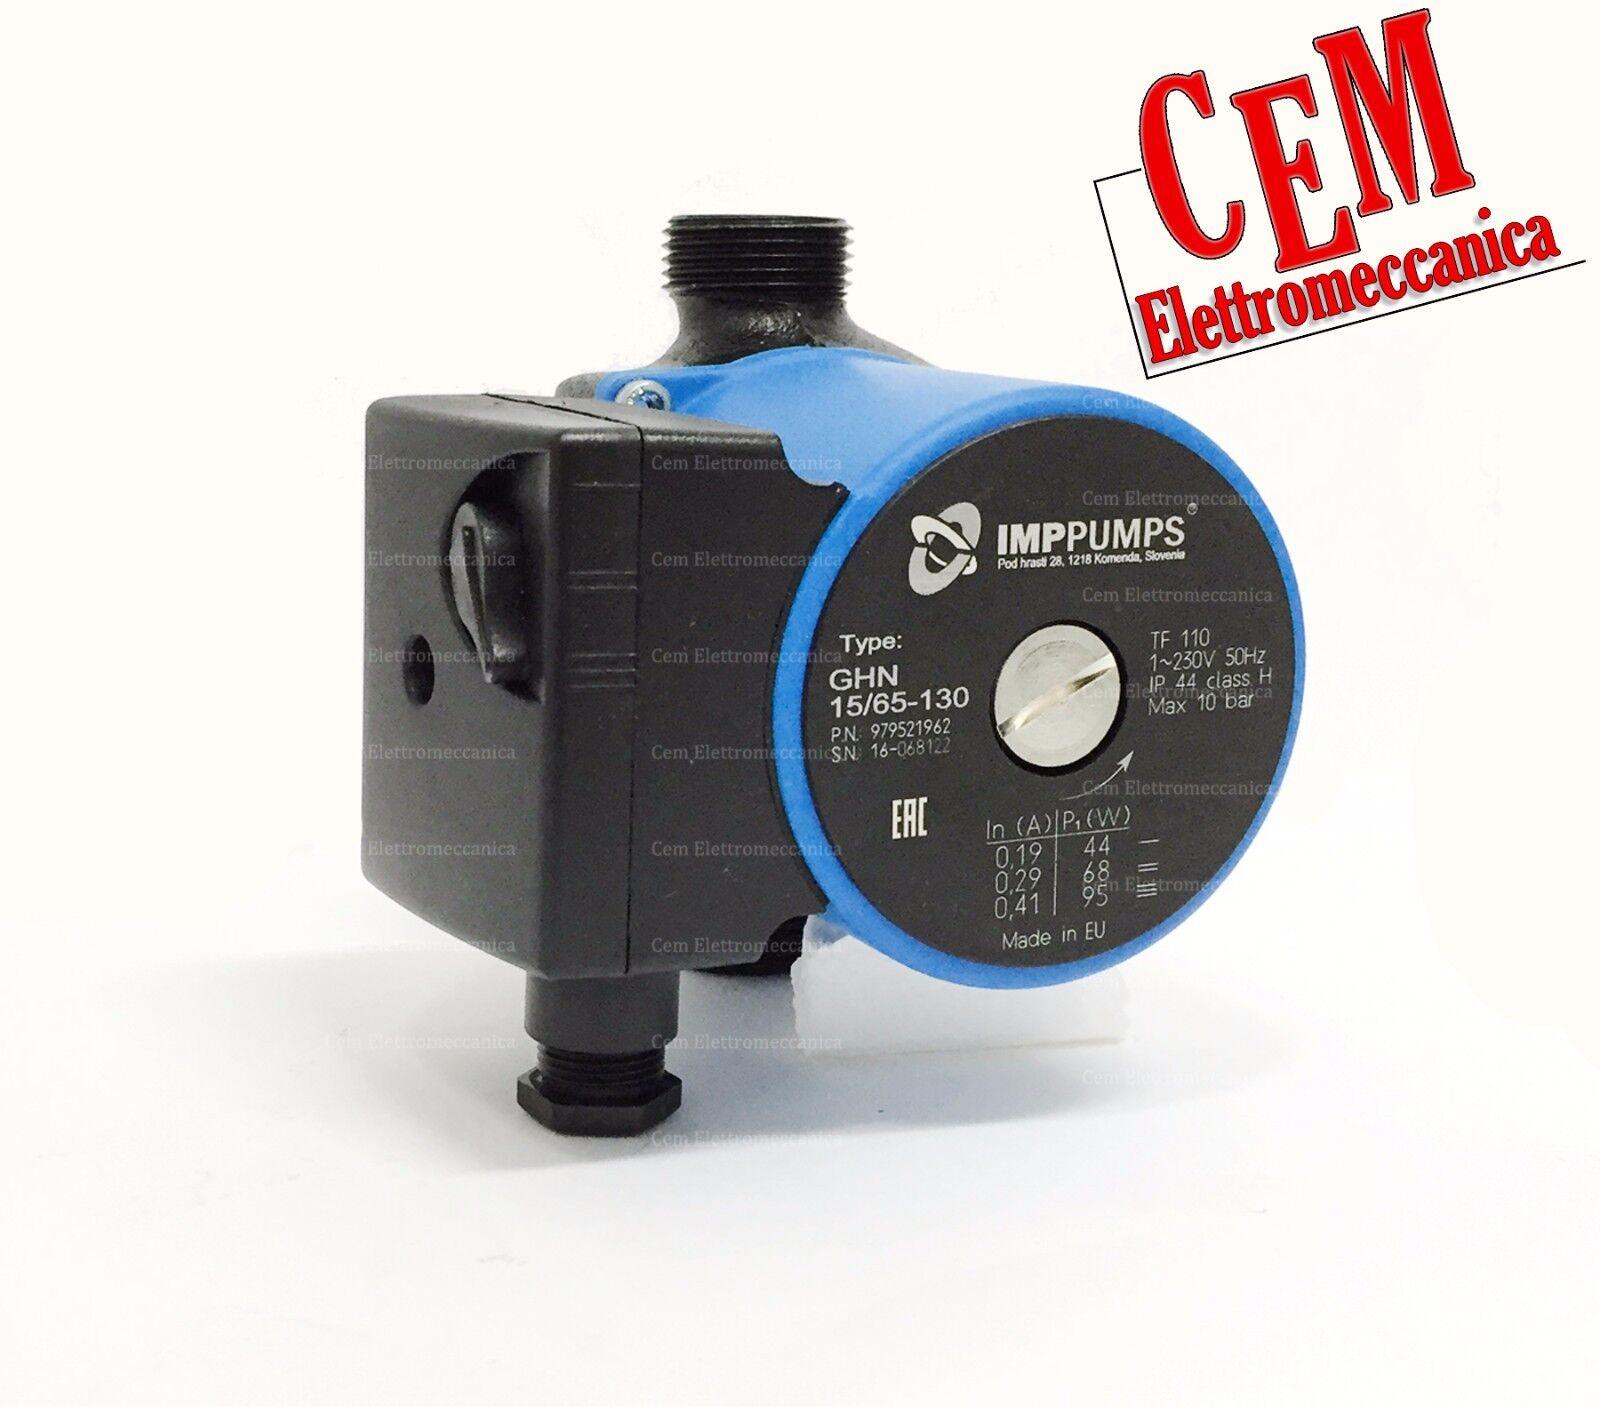 Circulateur Imp Pumps Ghn 15 65-130 -1   H 6,5 Metri Chaudière Pompe Chauffage